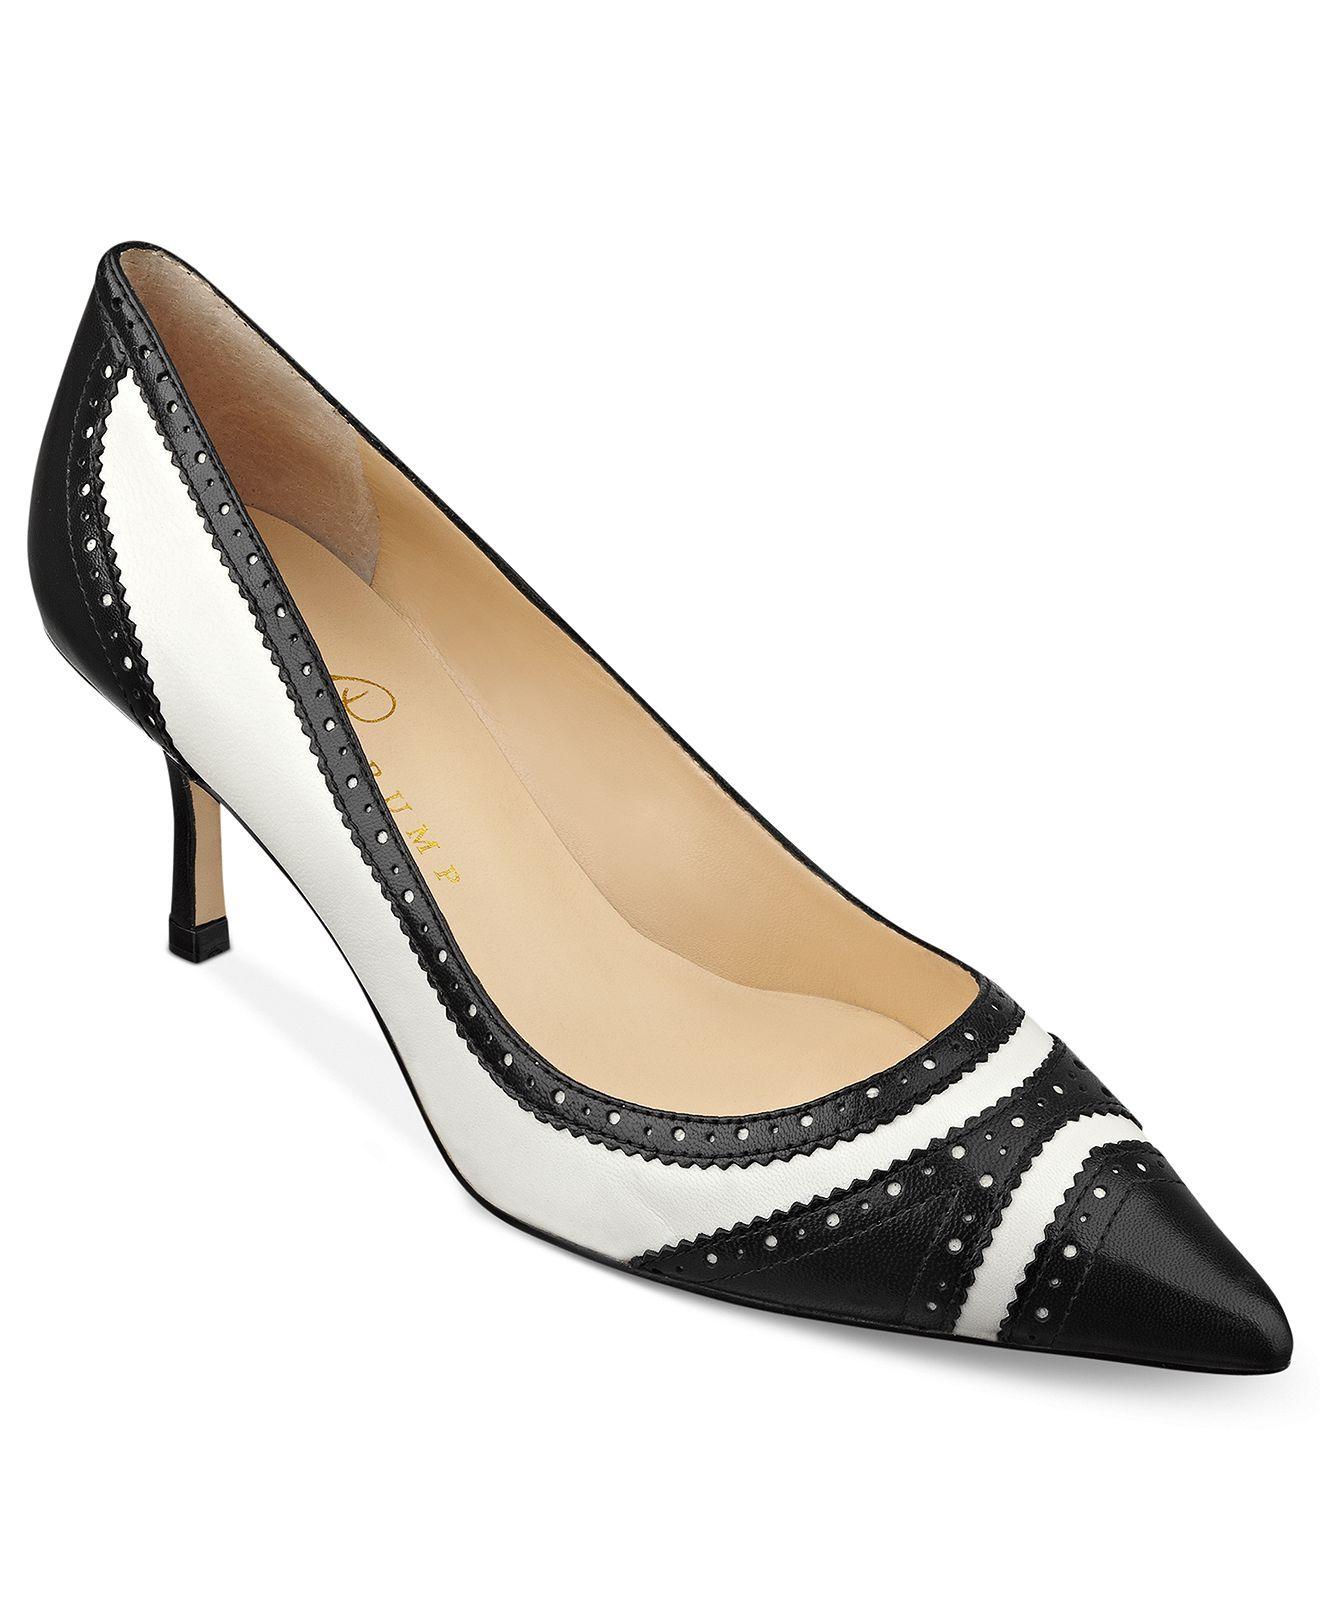 Ivanka Trump Shoes, Ilyssa Mid Heel Pumps - Designer Shoe Shop - Shoes -  Macys